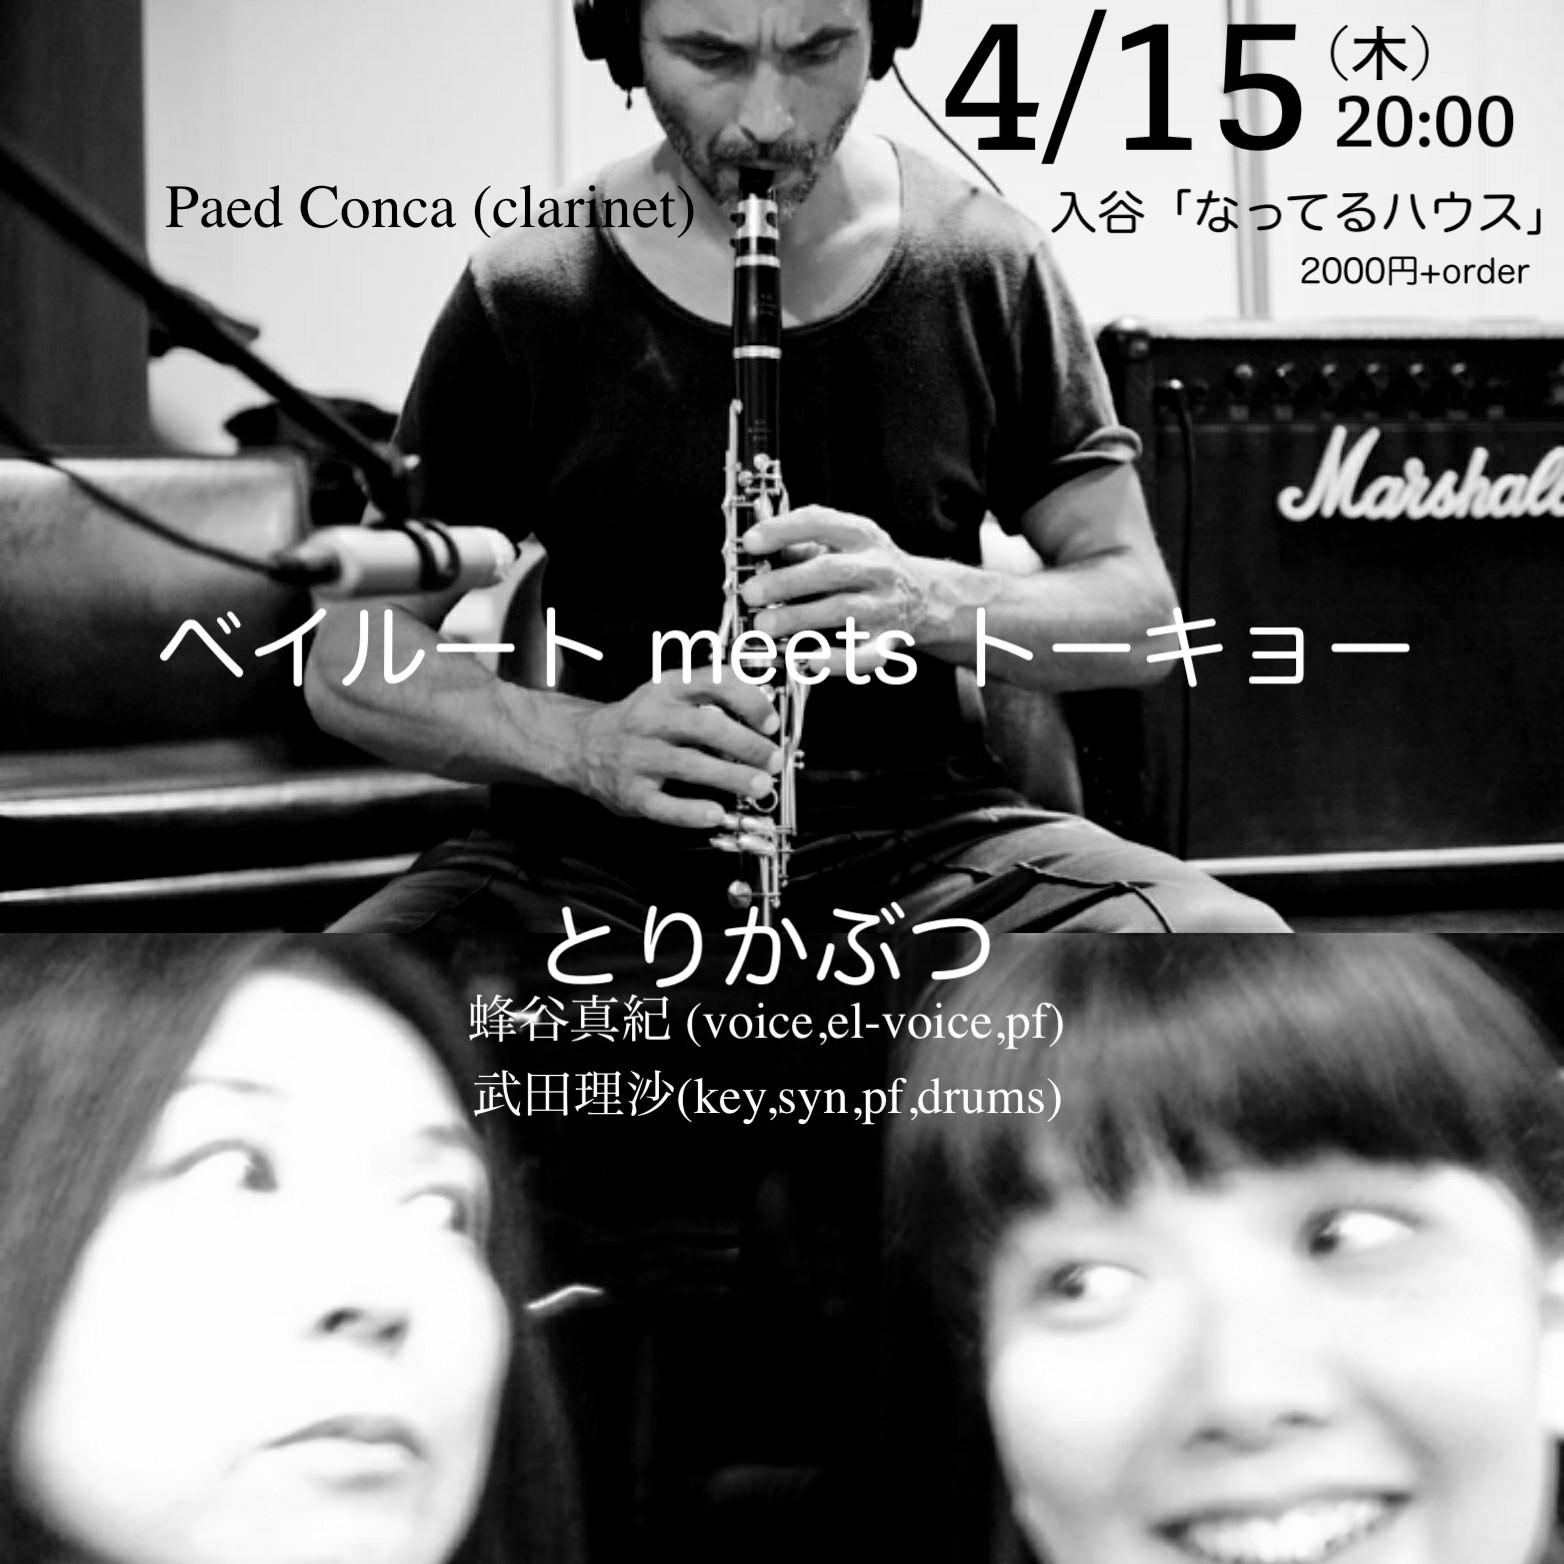 Maki Hachiya 2020:3月-4月 live schedule_d0239981_17004142.jpg